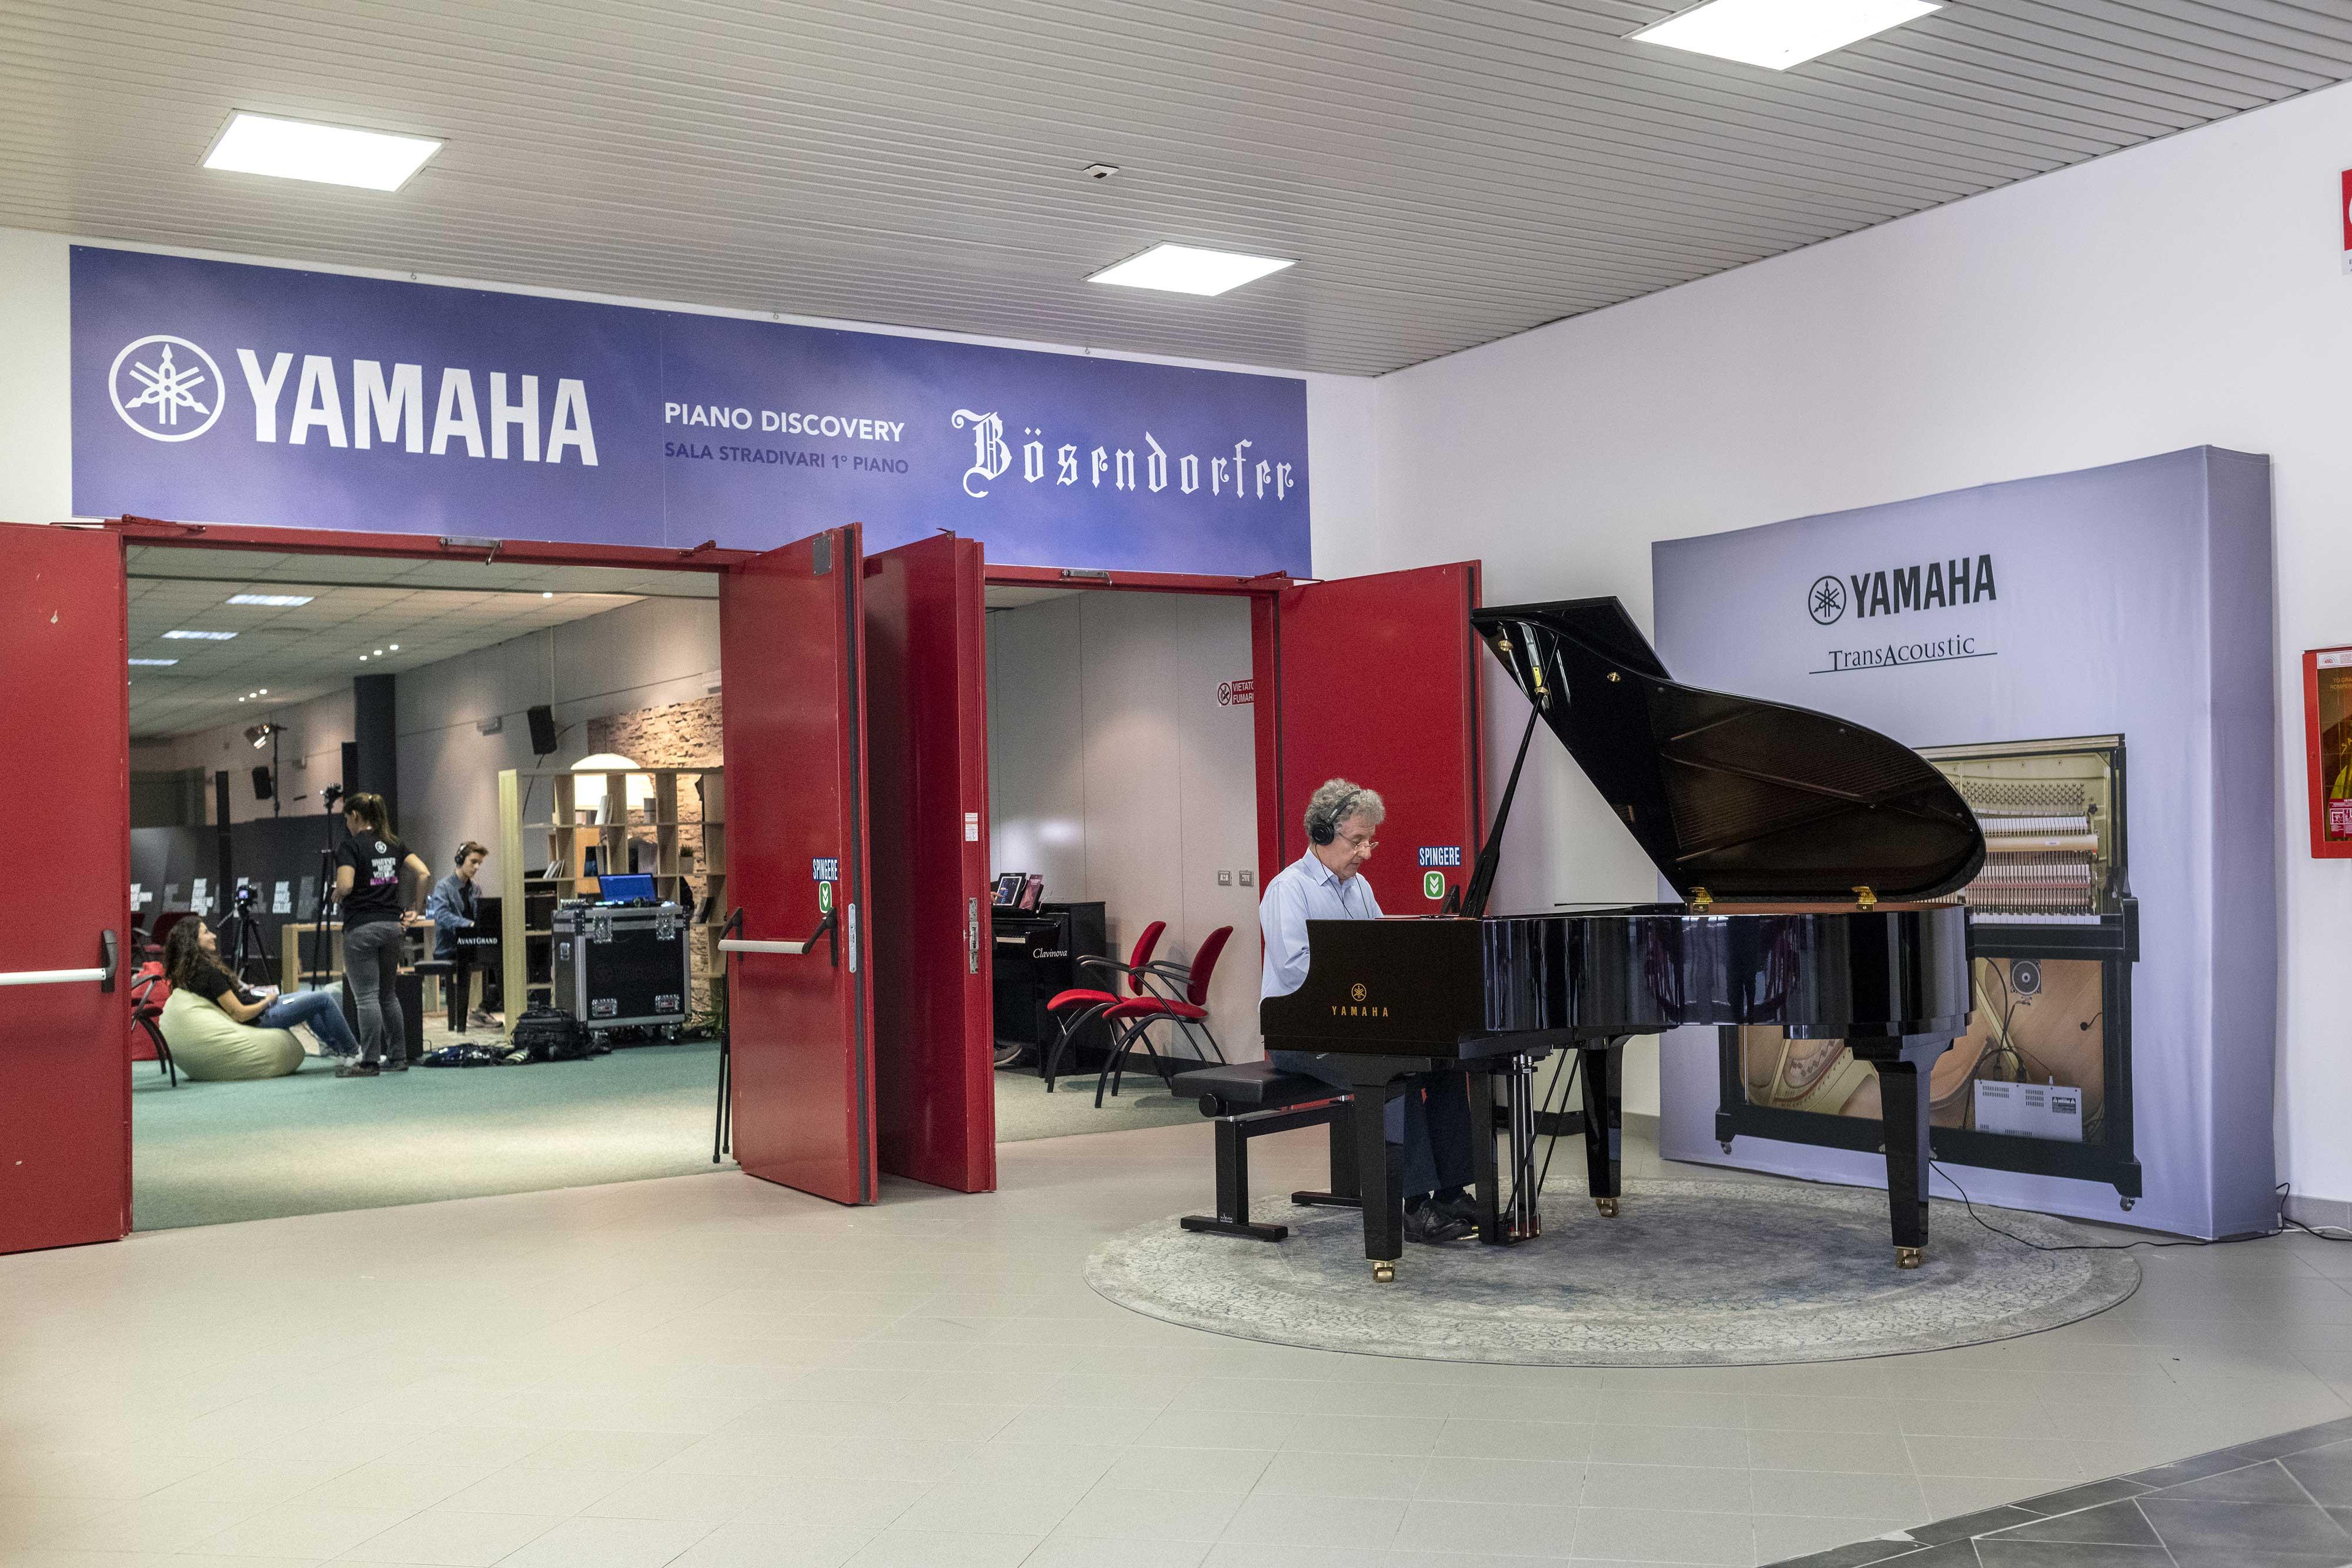 Yamaha & Bösendorfer piano discovery